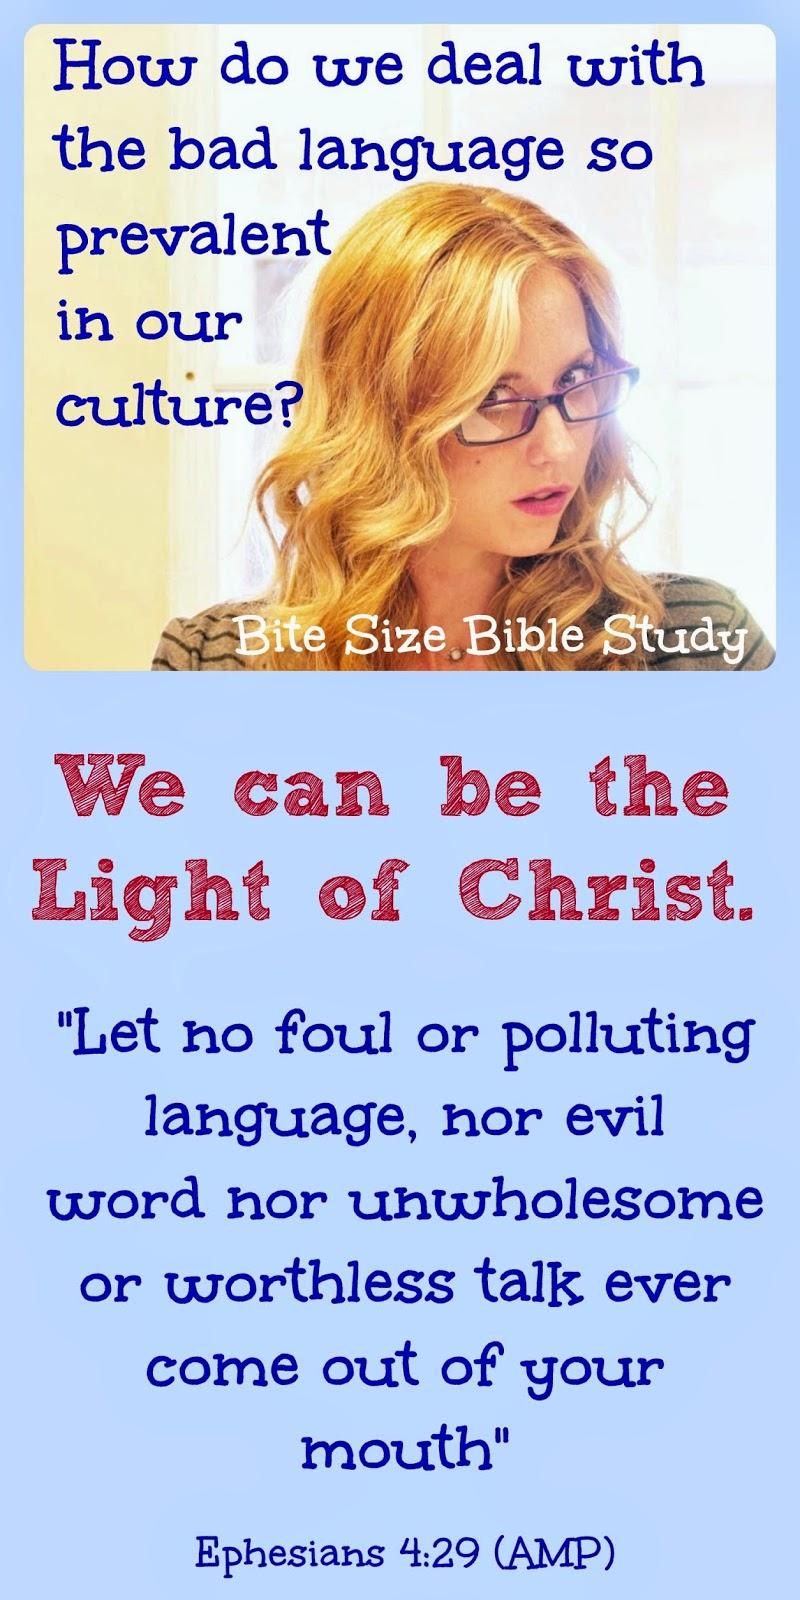 cussing, cursing, profanity, bad language, Bible, Philippians 2:14-15, Ephesians 5:29